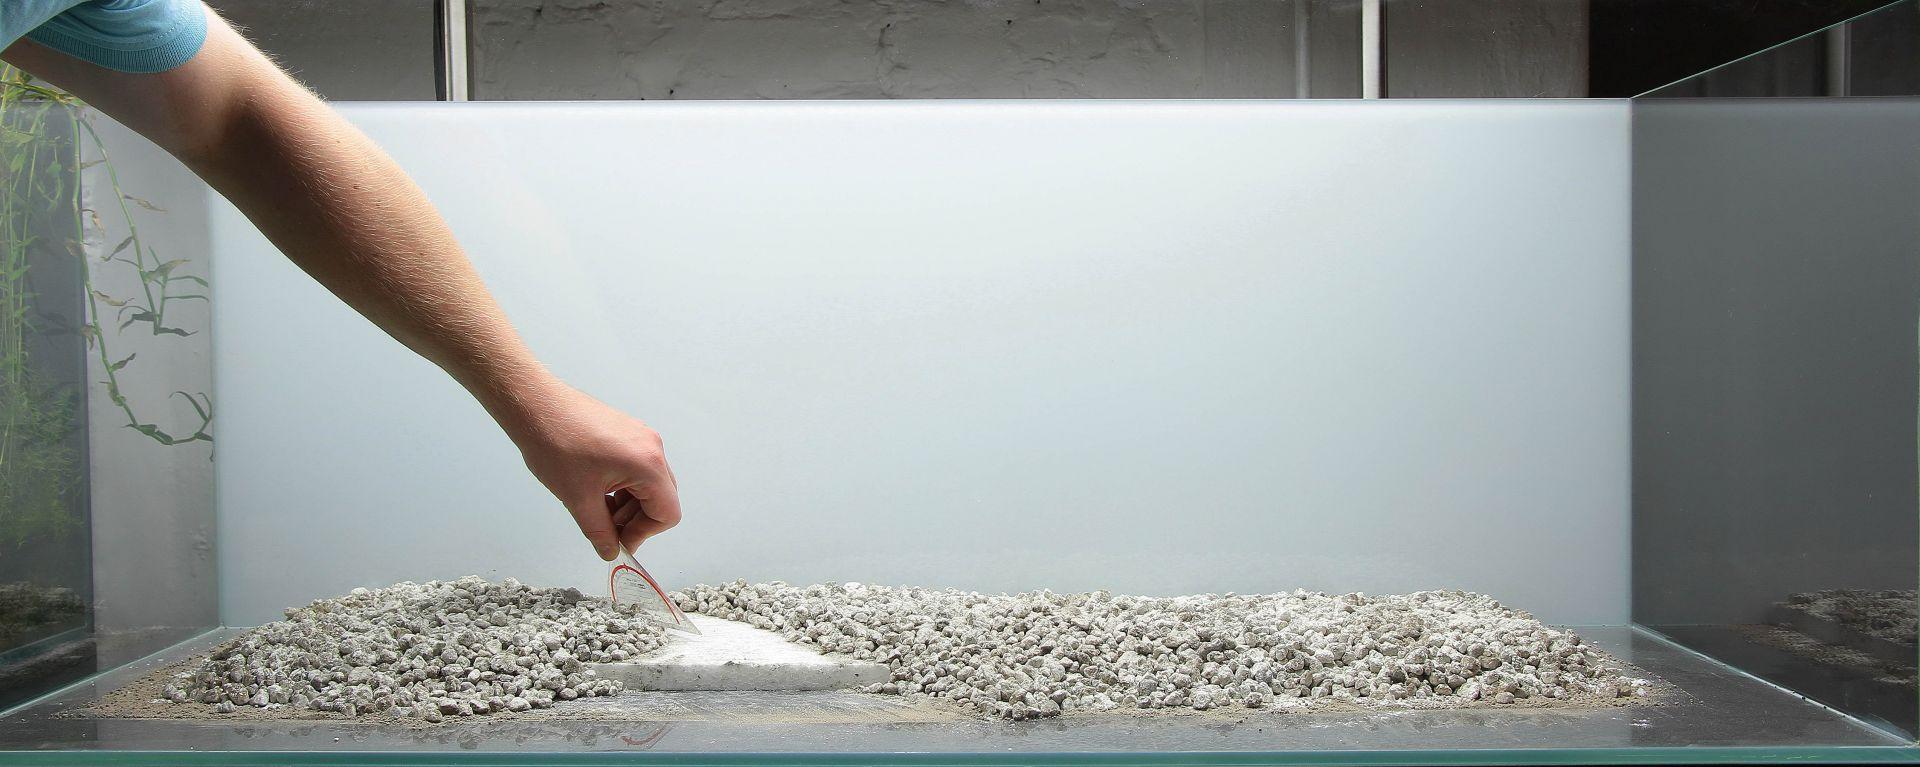 Modellieren des Bodengrundes